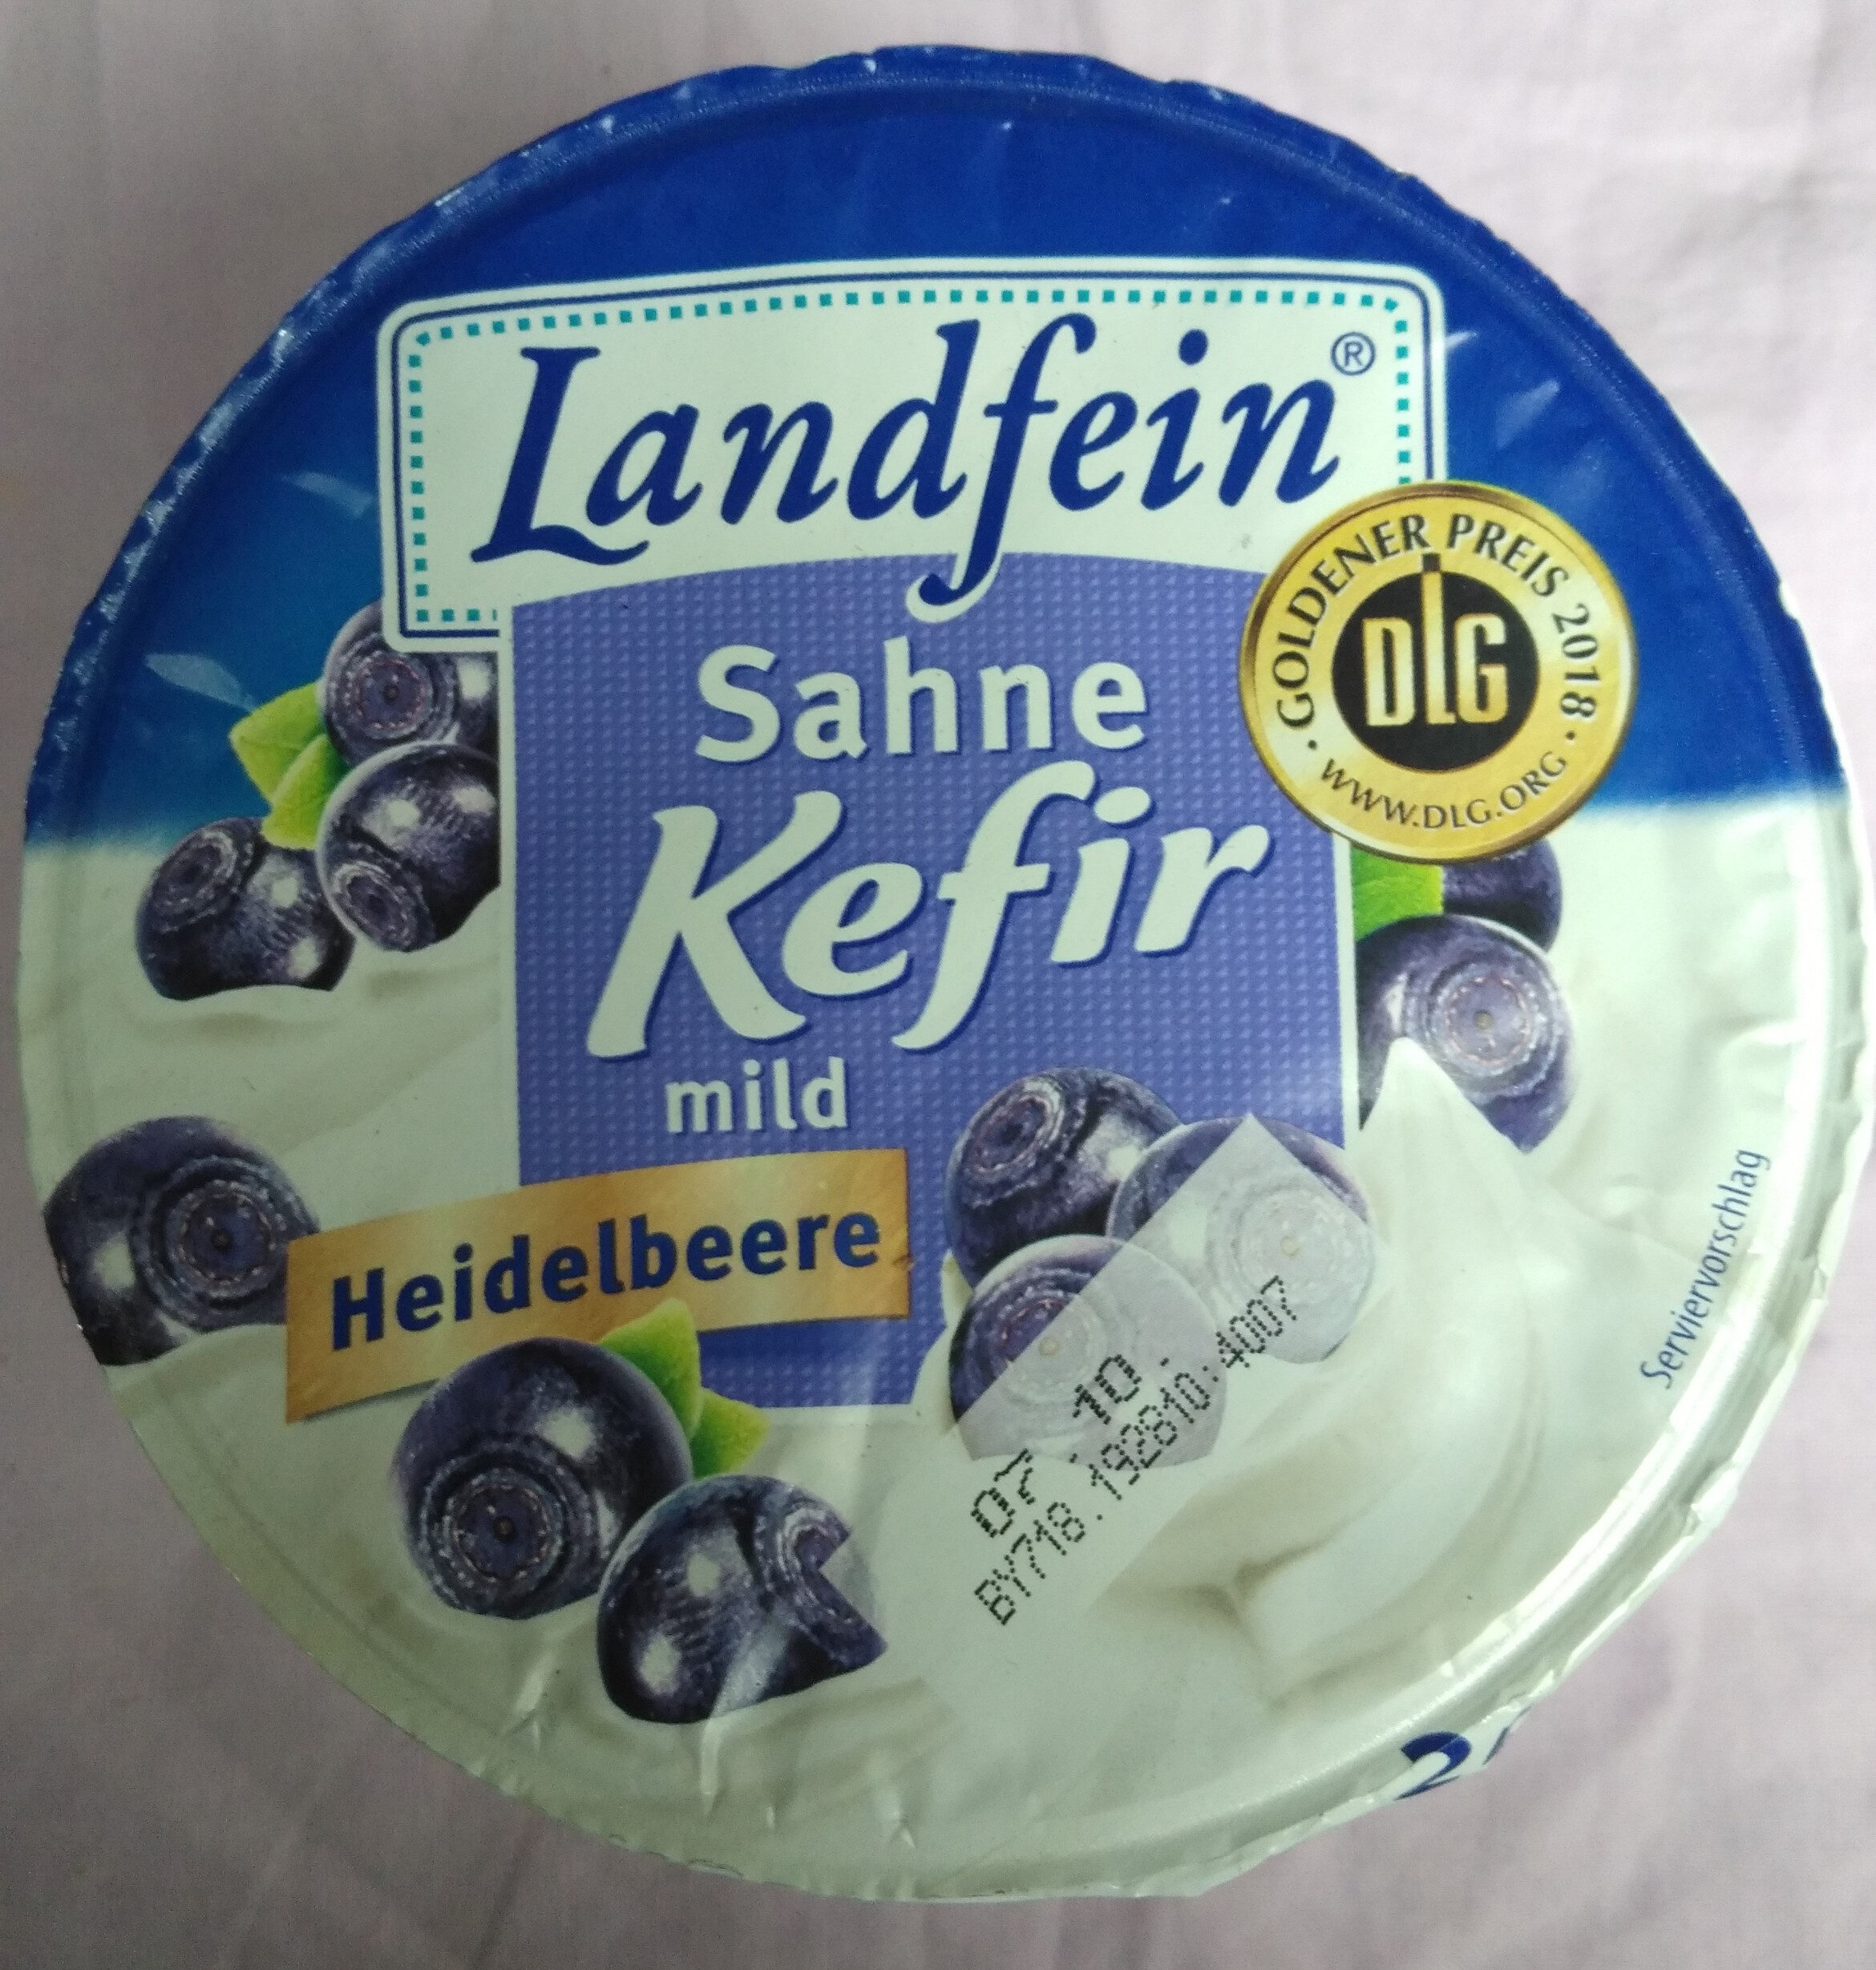 Sahne Kefir mild Heidelbeere - Product - de